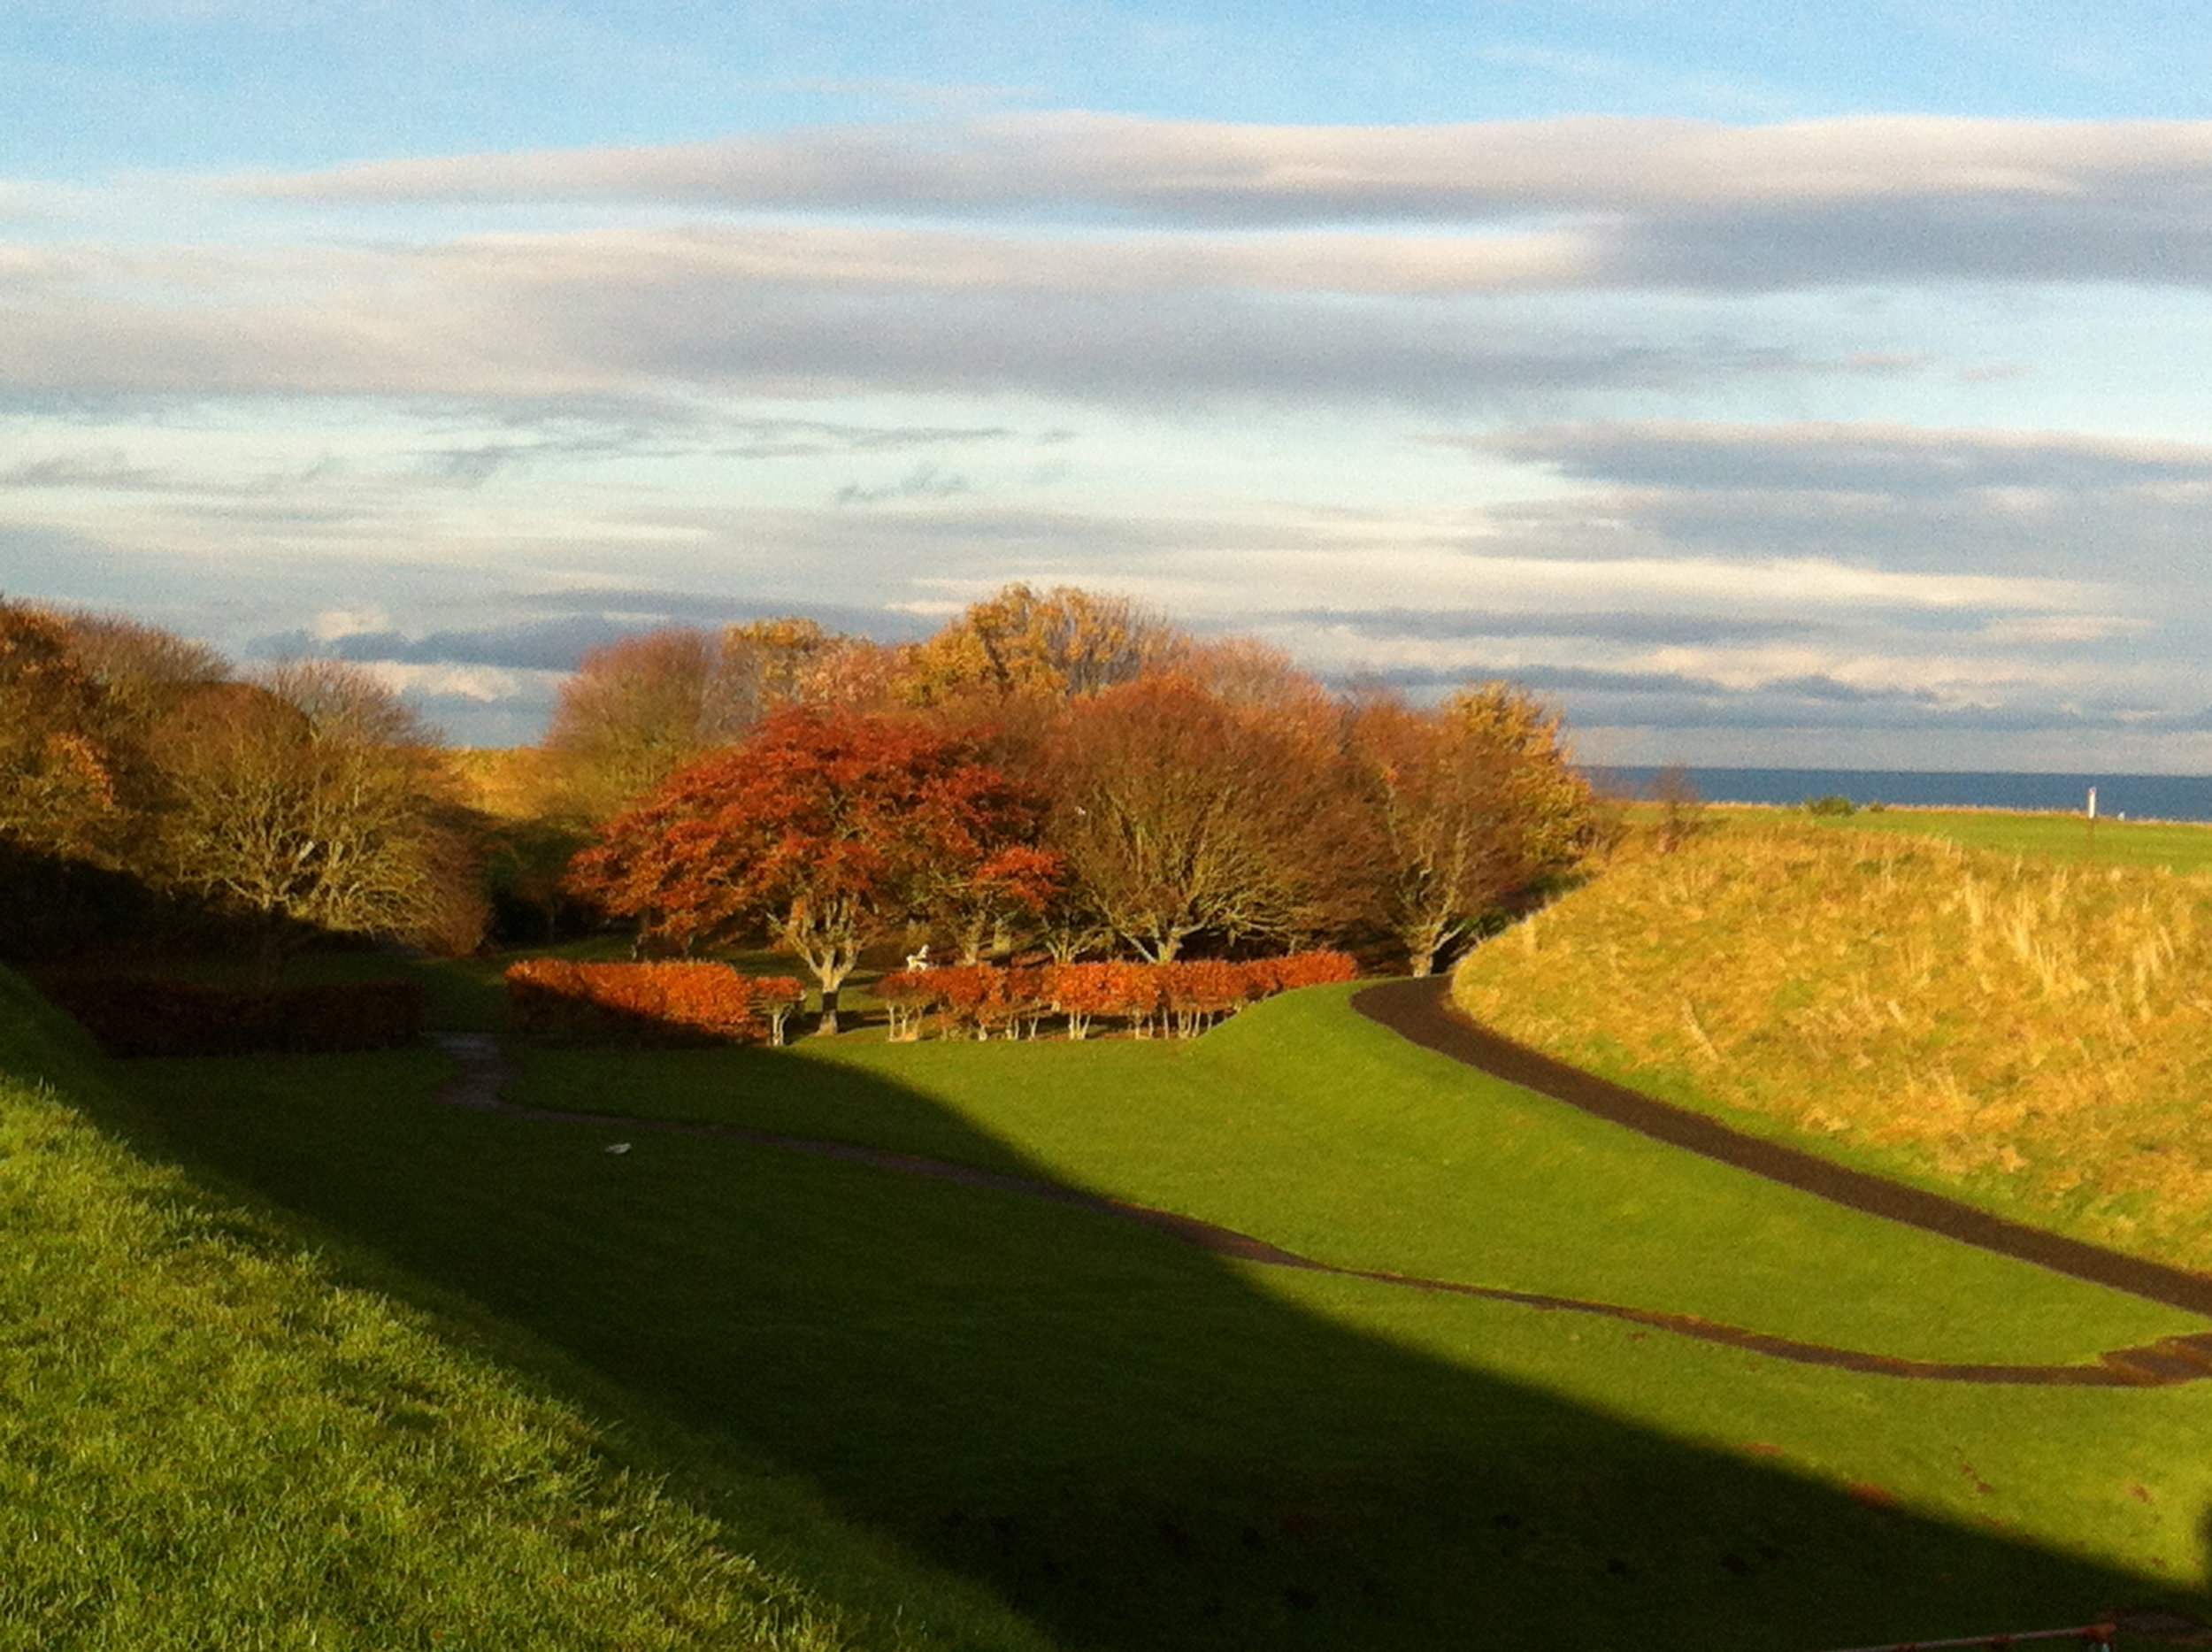 Wandering around Berwick-upon-Tweed in November